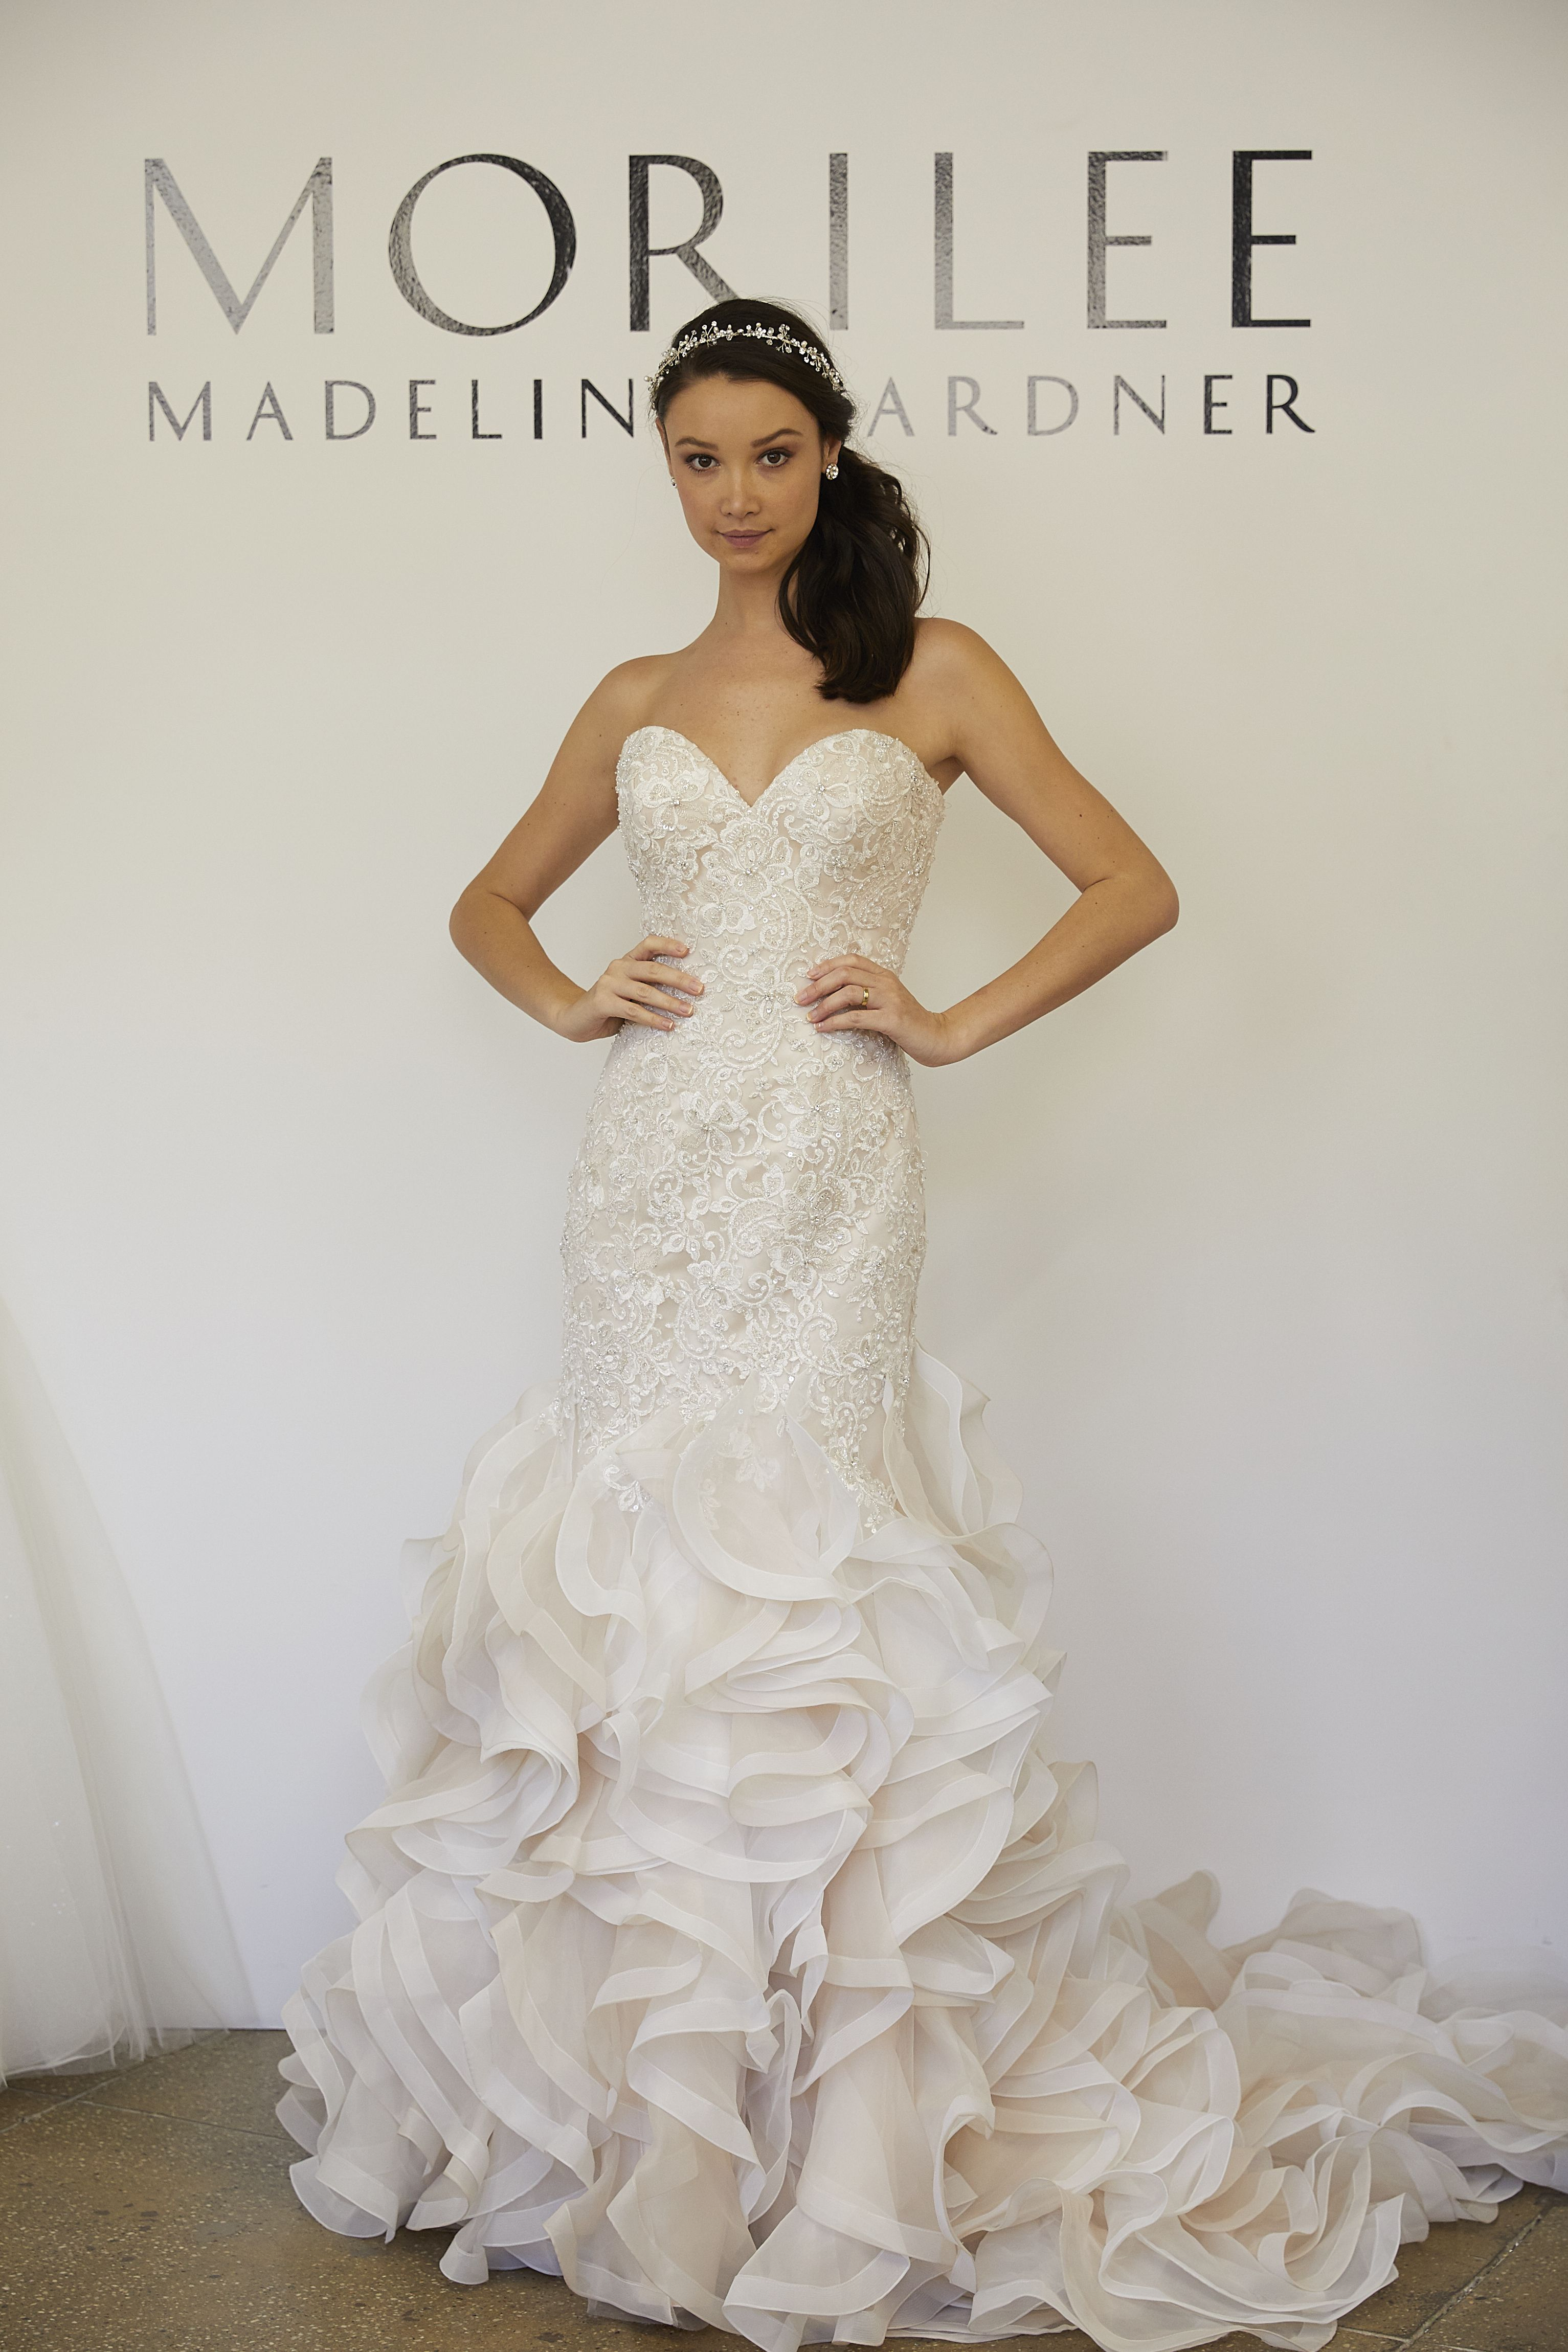 Mori lee madeline gardner wedding dress  Morilee  Madeline Gardner Mirjana Bridal Dress Glamorous